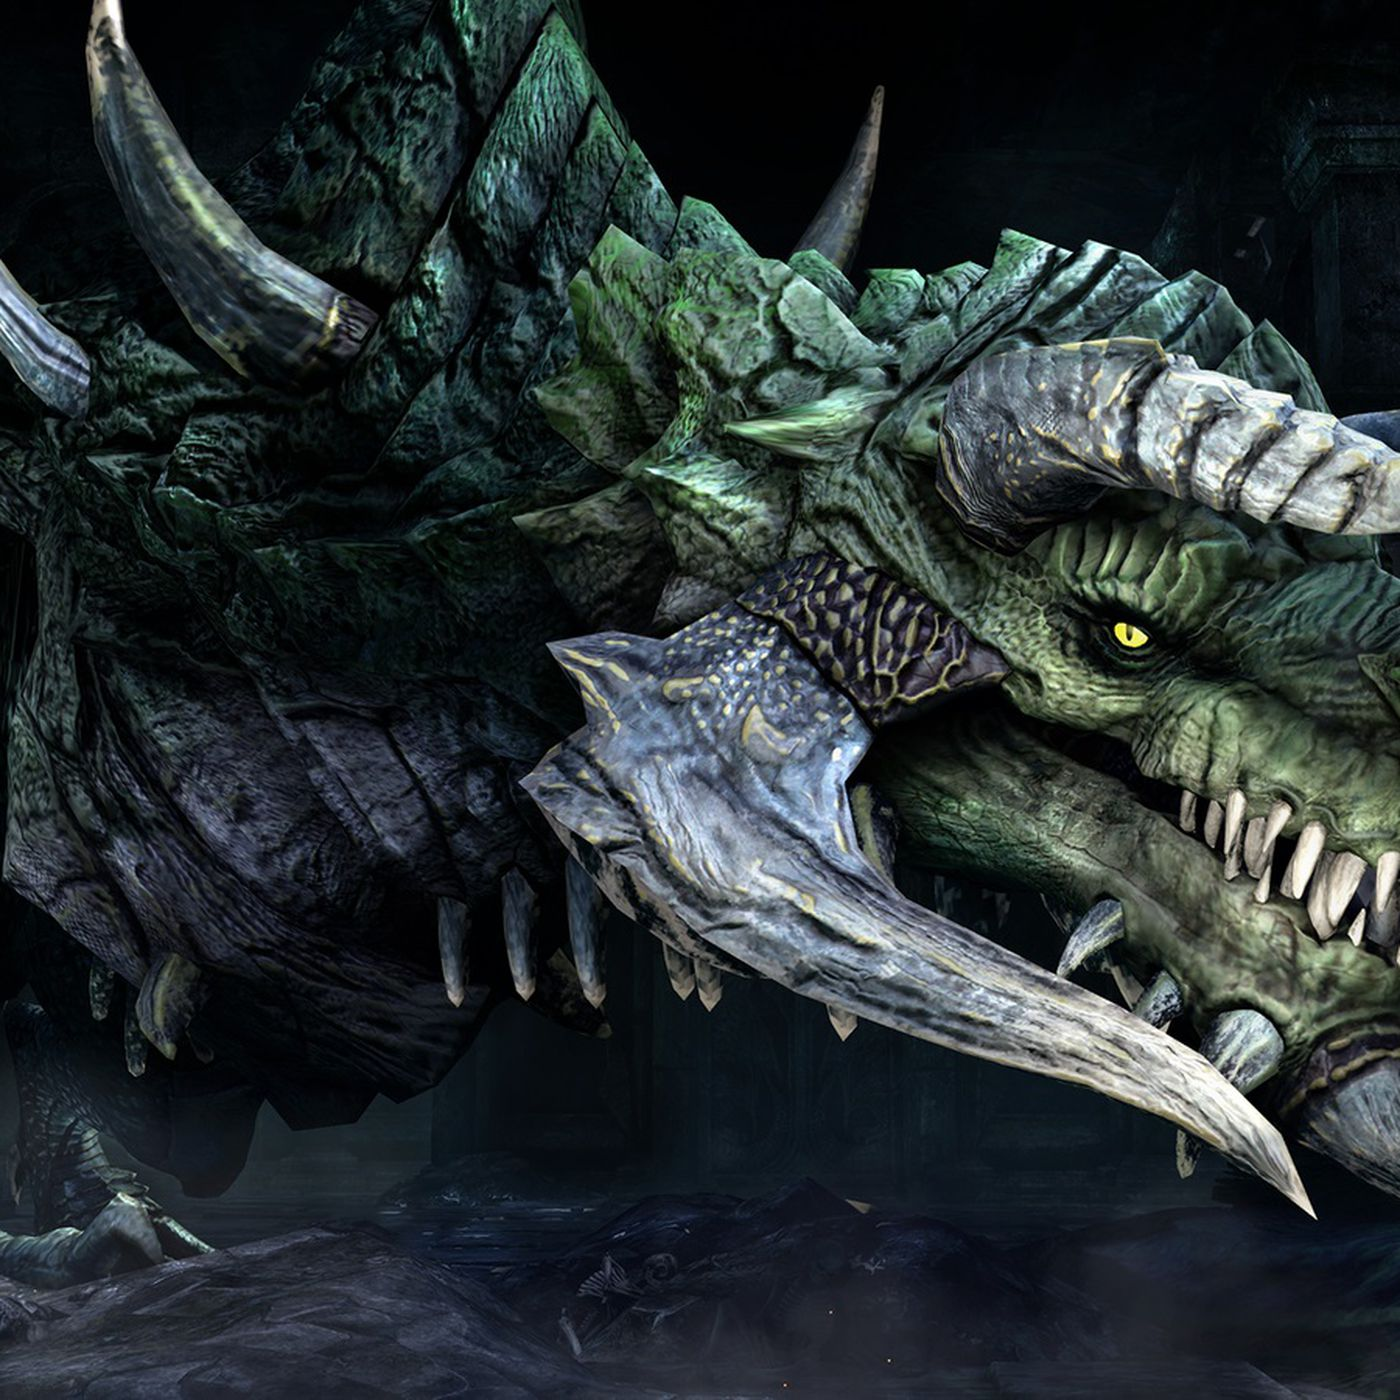 Dragons heading to Elder Scrolls Online in new updates - Polygon